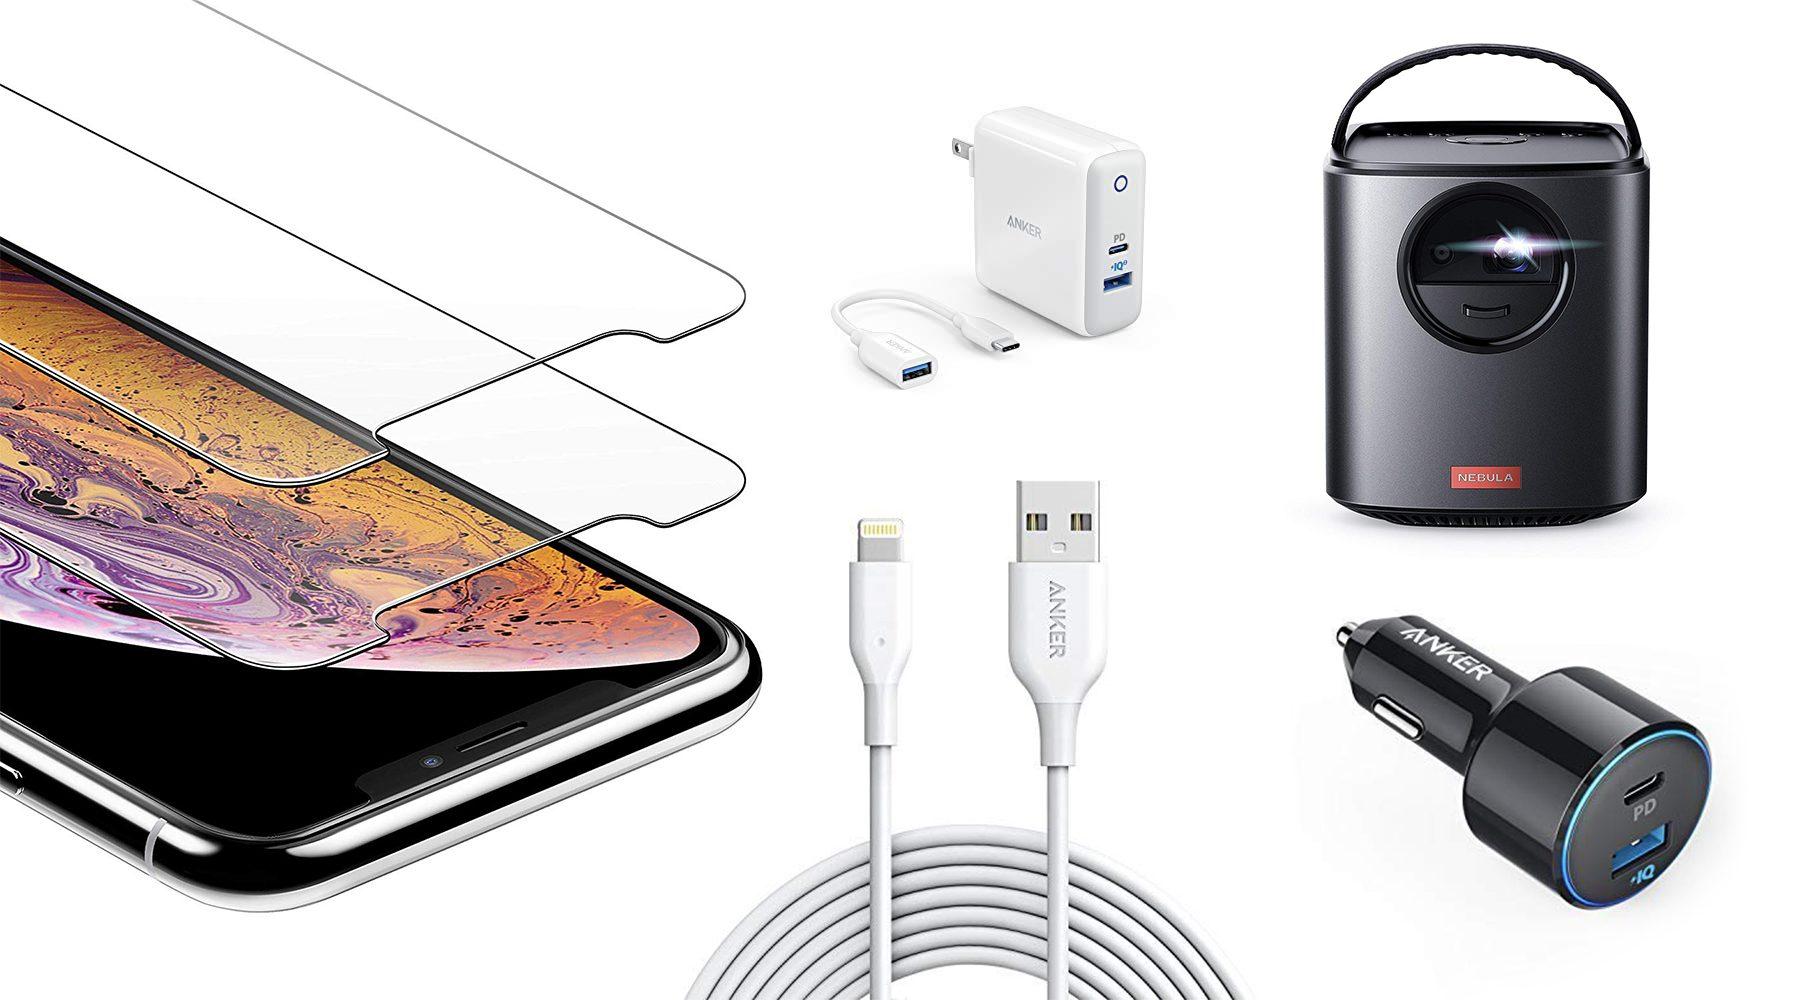 9to5Toys Letzter Aufruf: Samsung Gear S3 Smartwatch 200, Amazon Echo Spot 100, Blue Snowball iCE Mic 30, mehr